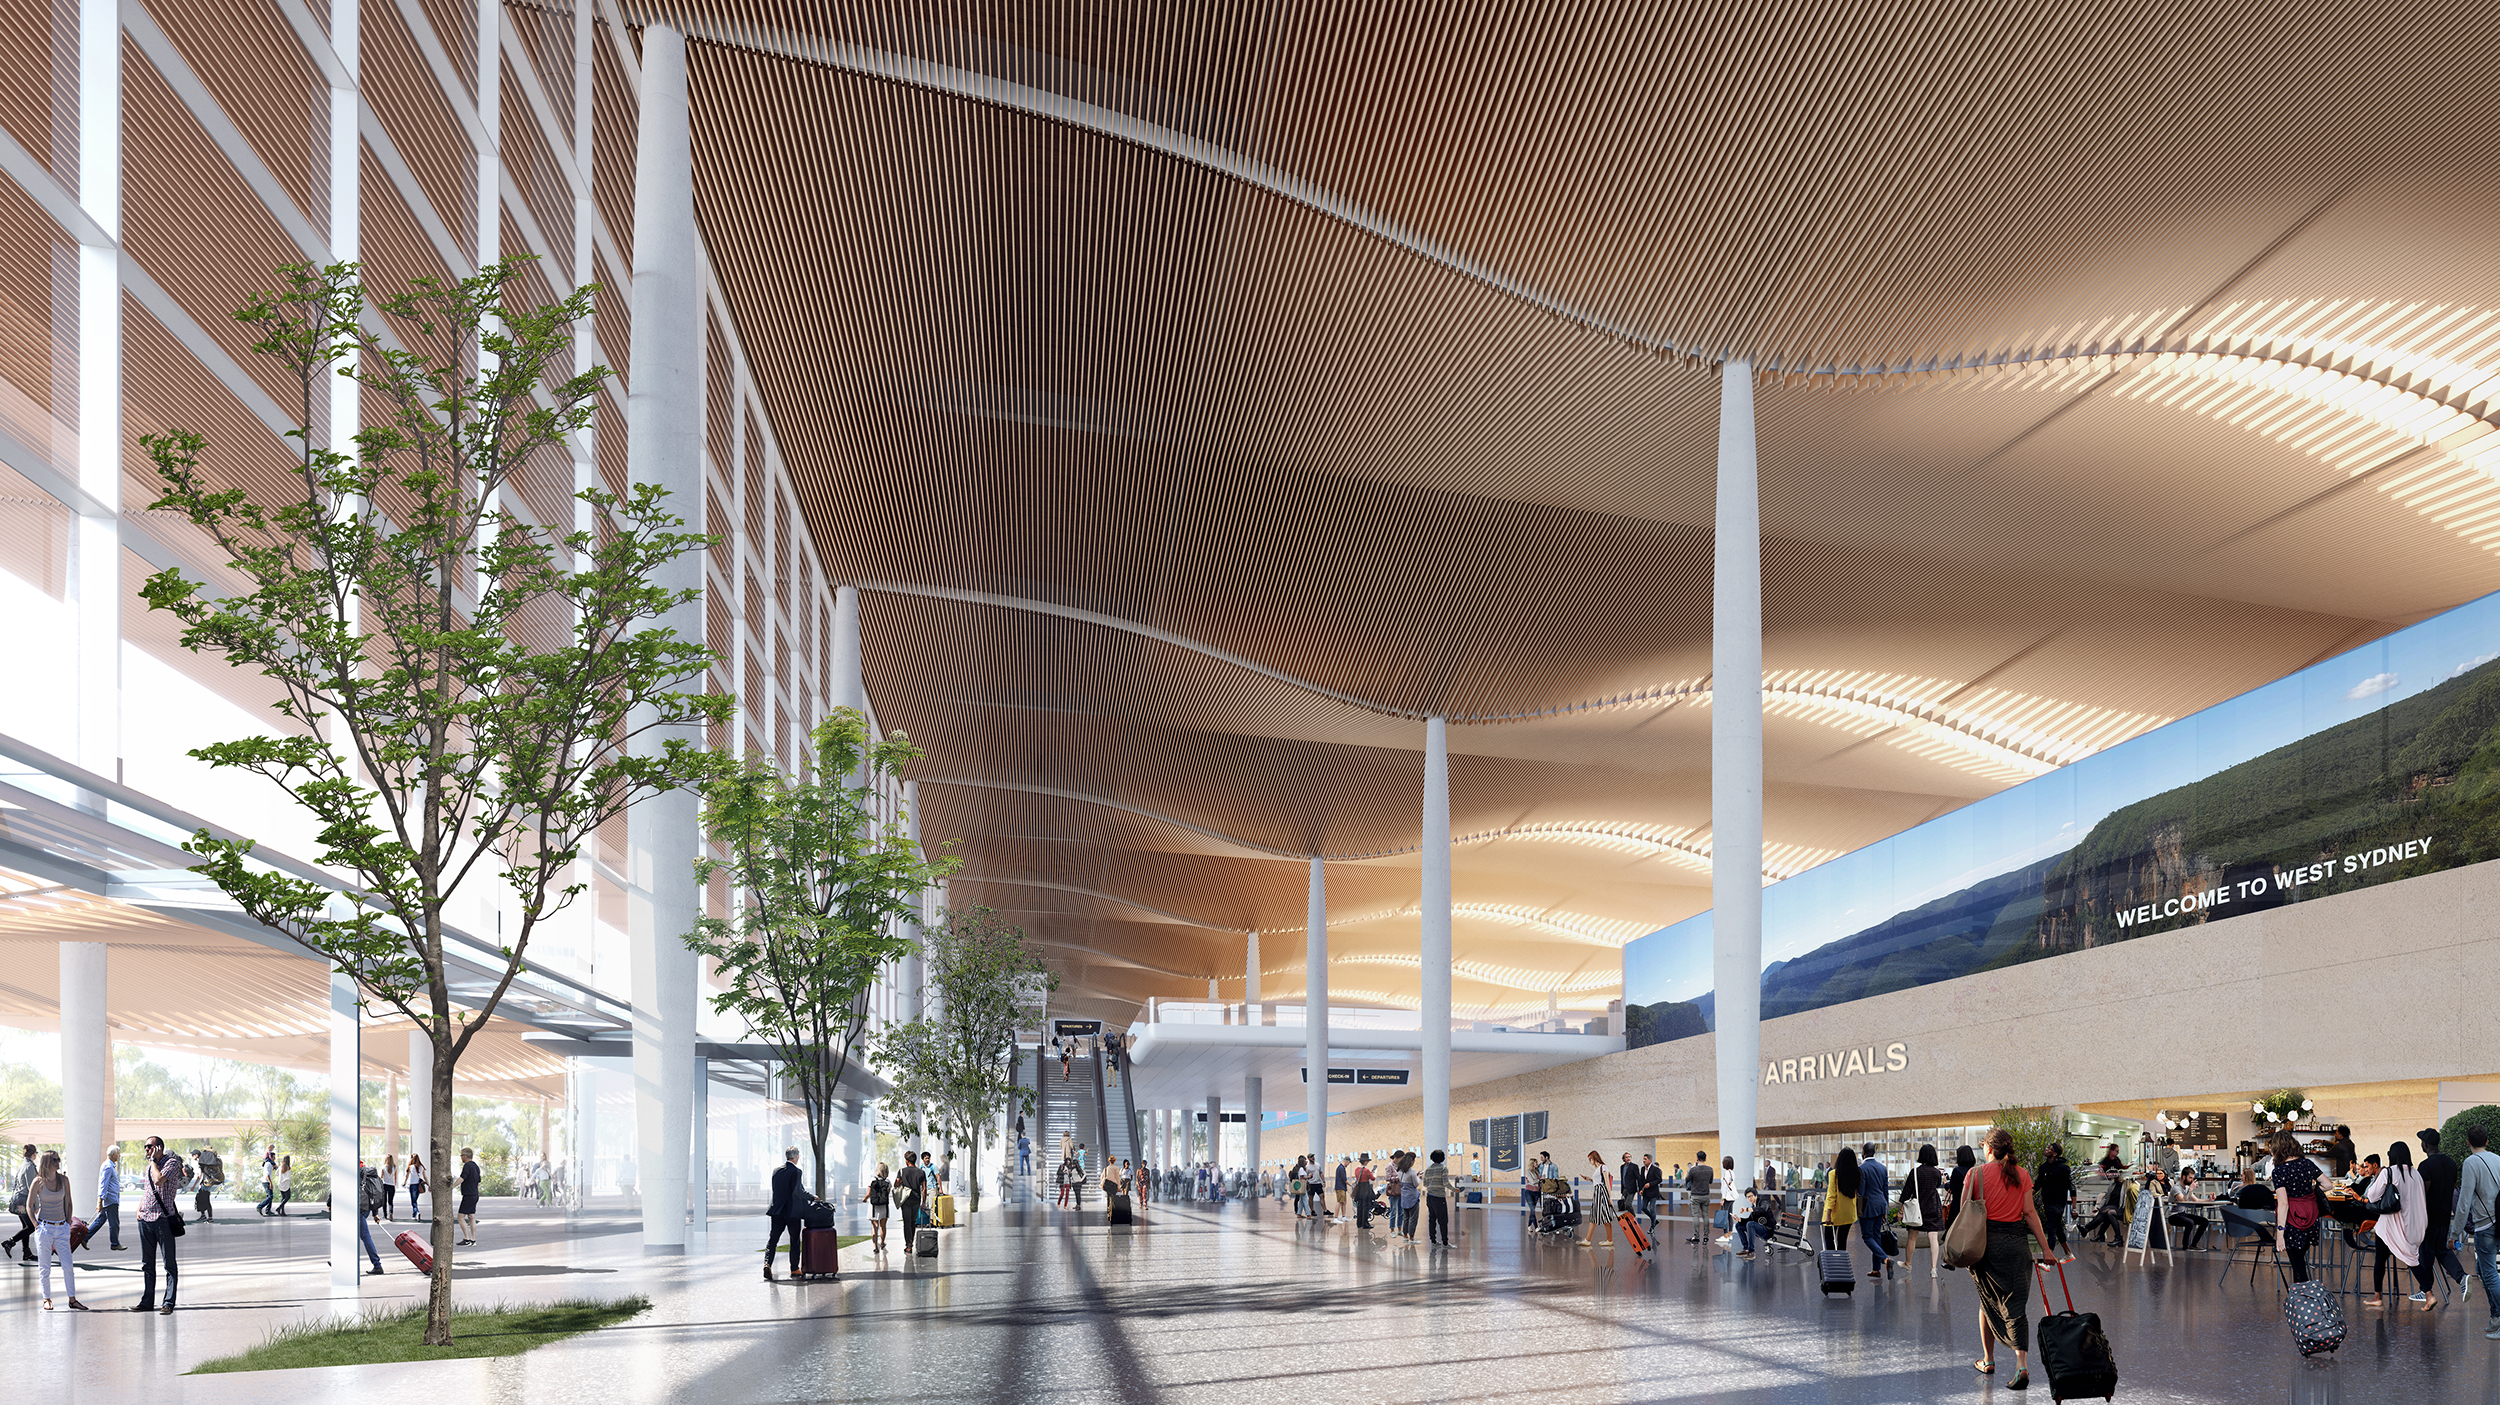 West Sydney Airport